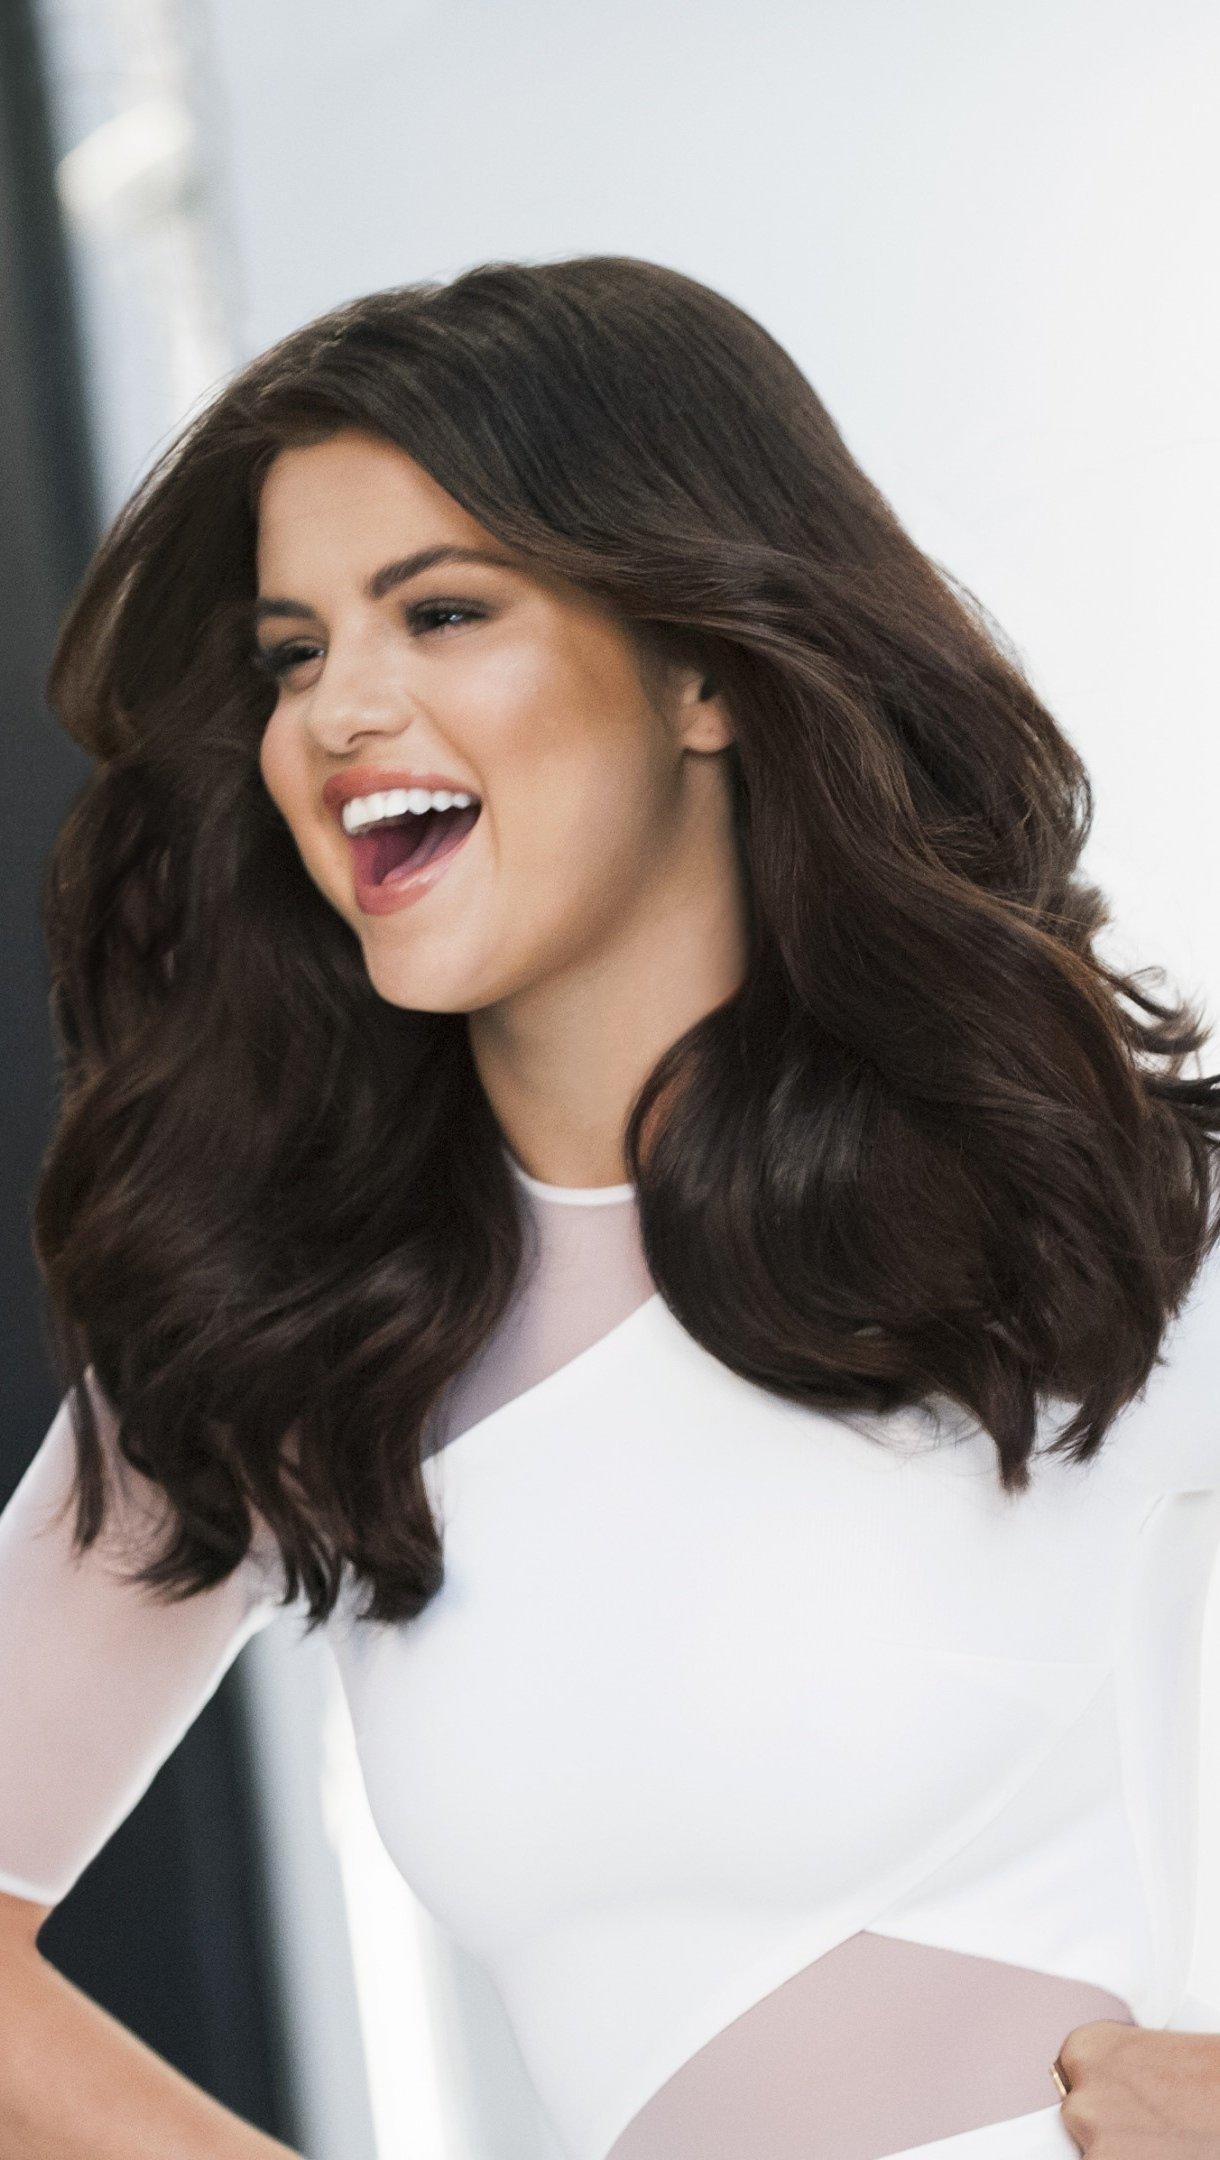 Wallpaper Singer Selena Gomez Vertical